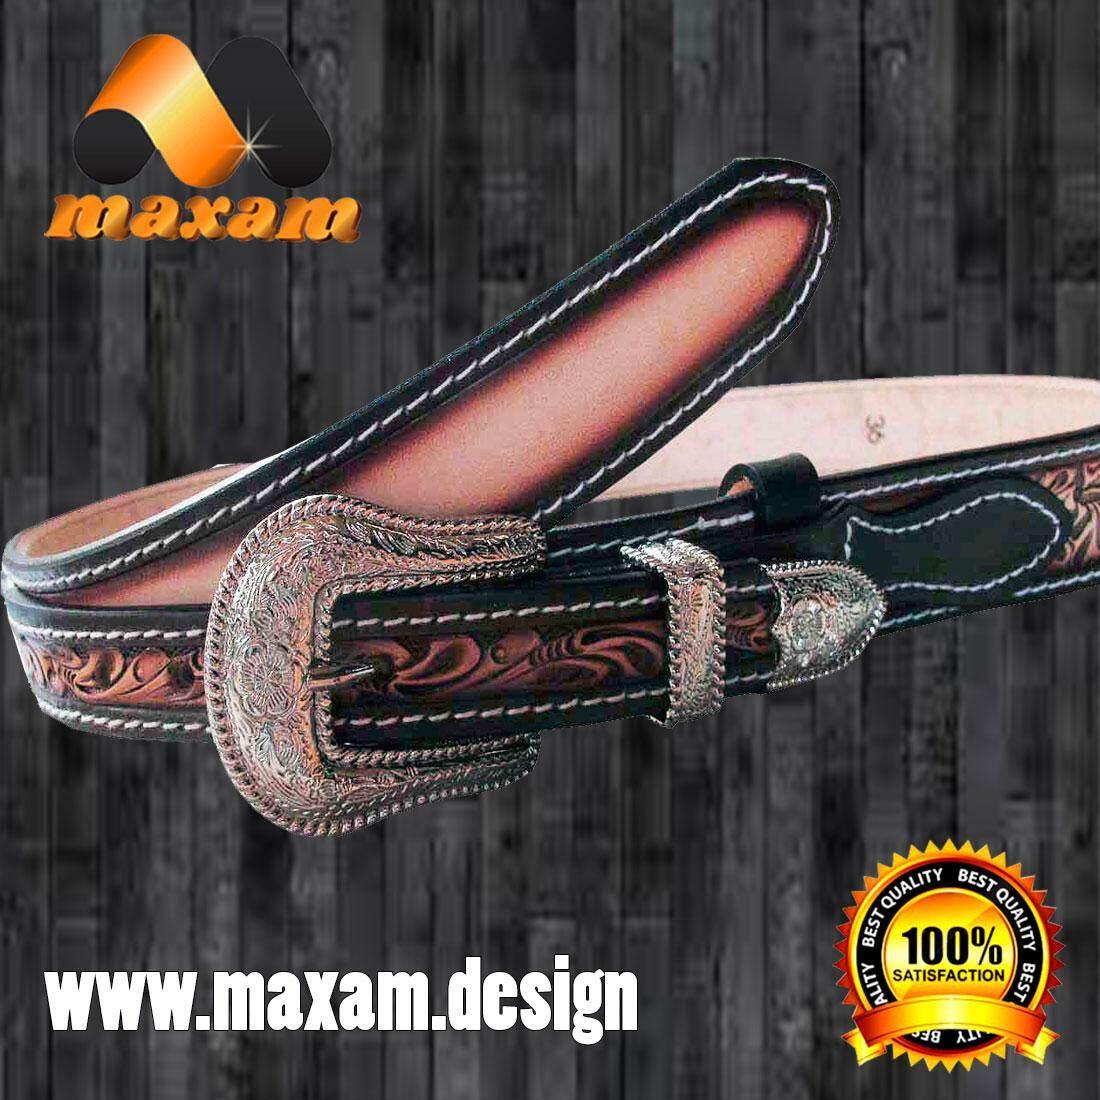 maxam design    เข้มขัดสวยทีสุดในสไตล์คาวบอย สายหนังเป็นลายไม้เลือยตลอดเส้น ของแท้หนังแท้ หัวเข้มขัดและปลายเข้มขัดโดดเด่นด้วยสีเงิน เป็นหัวและปลายสายเป็นนิกเกล    maxam design